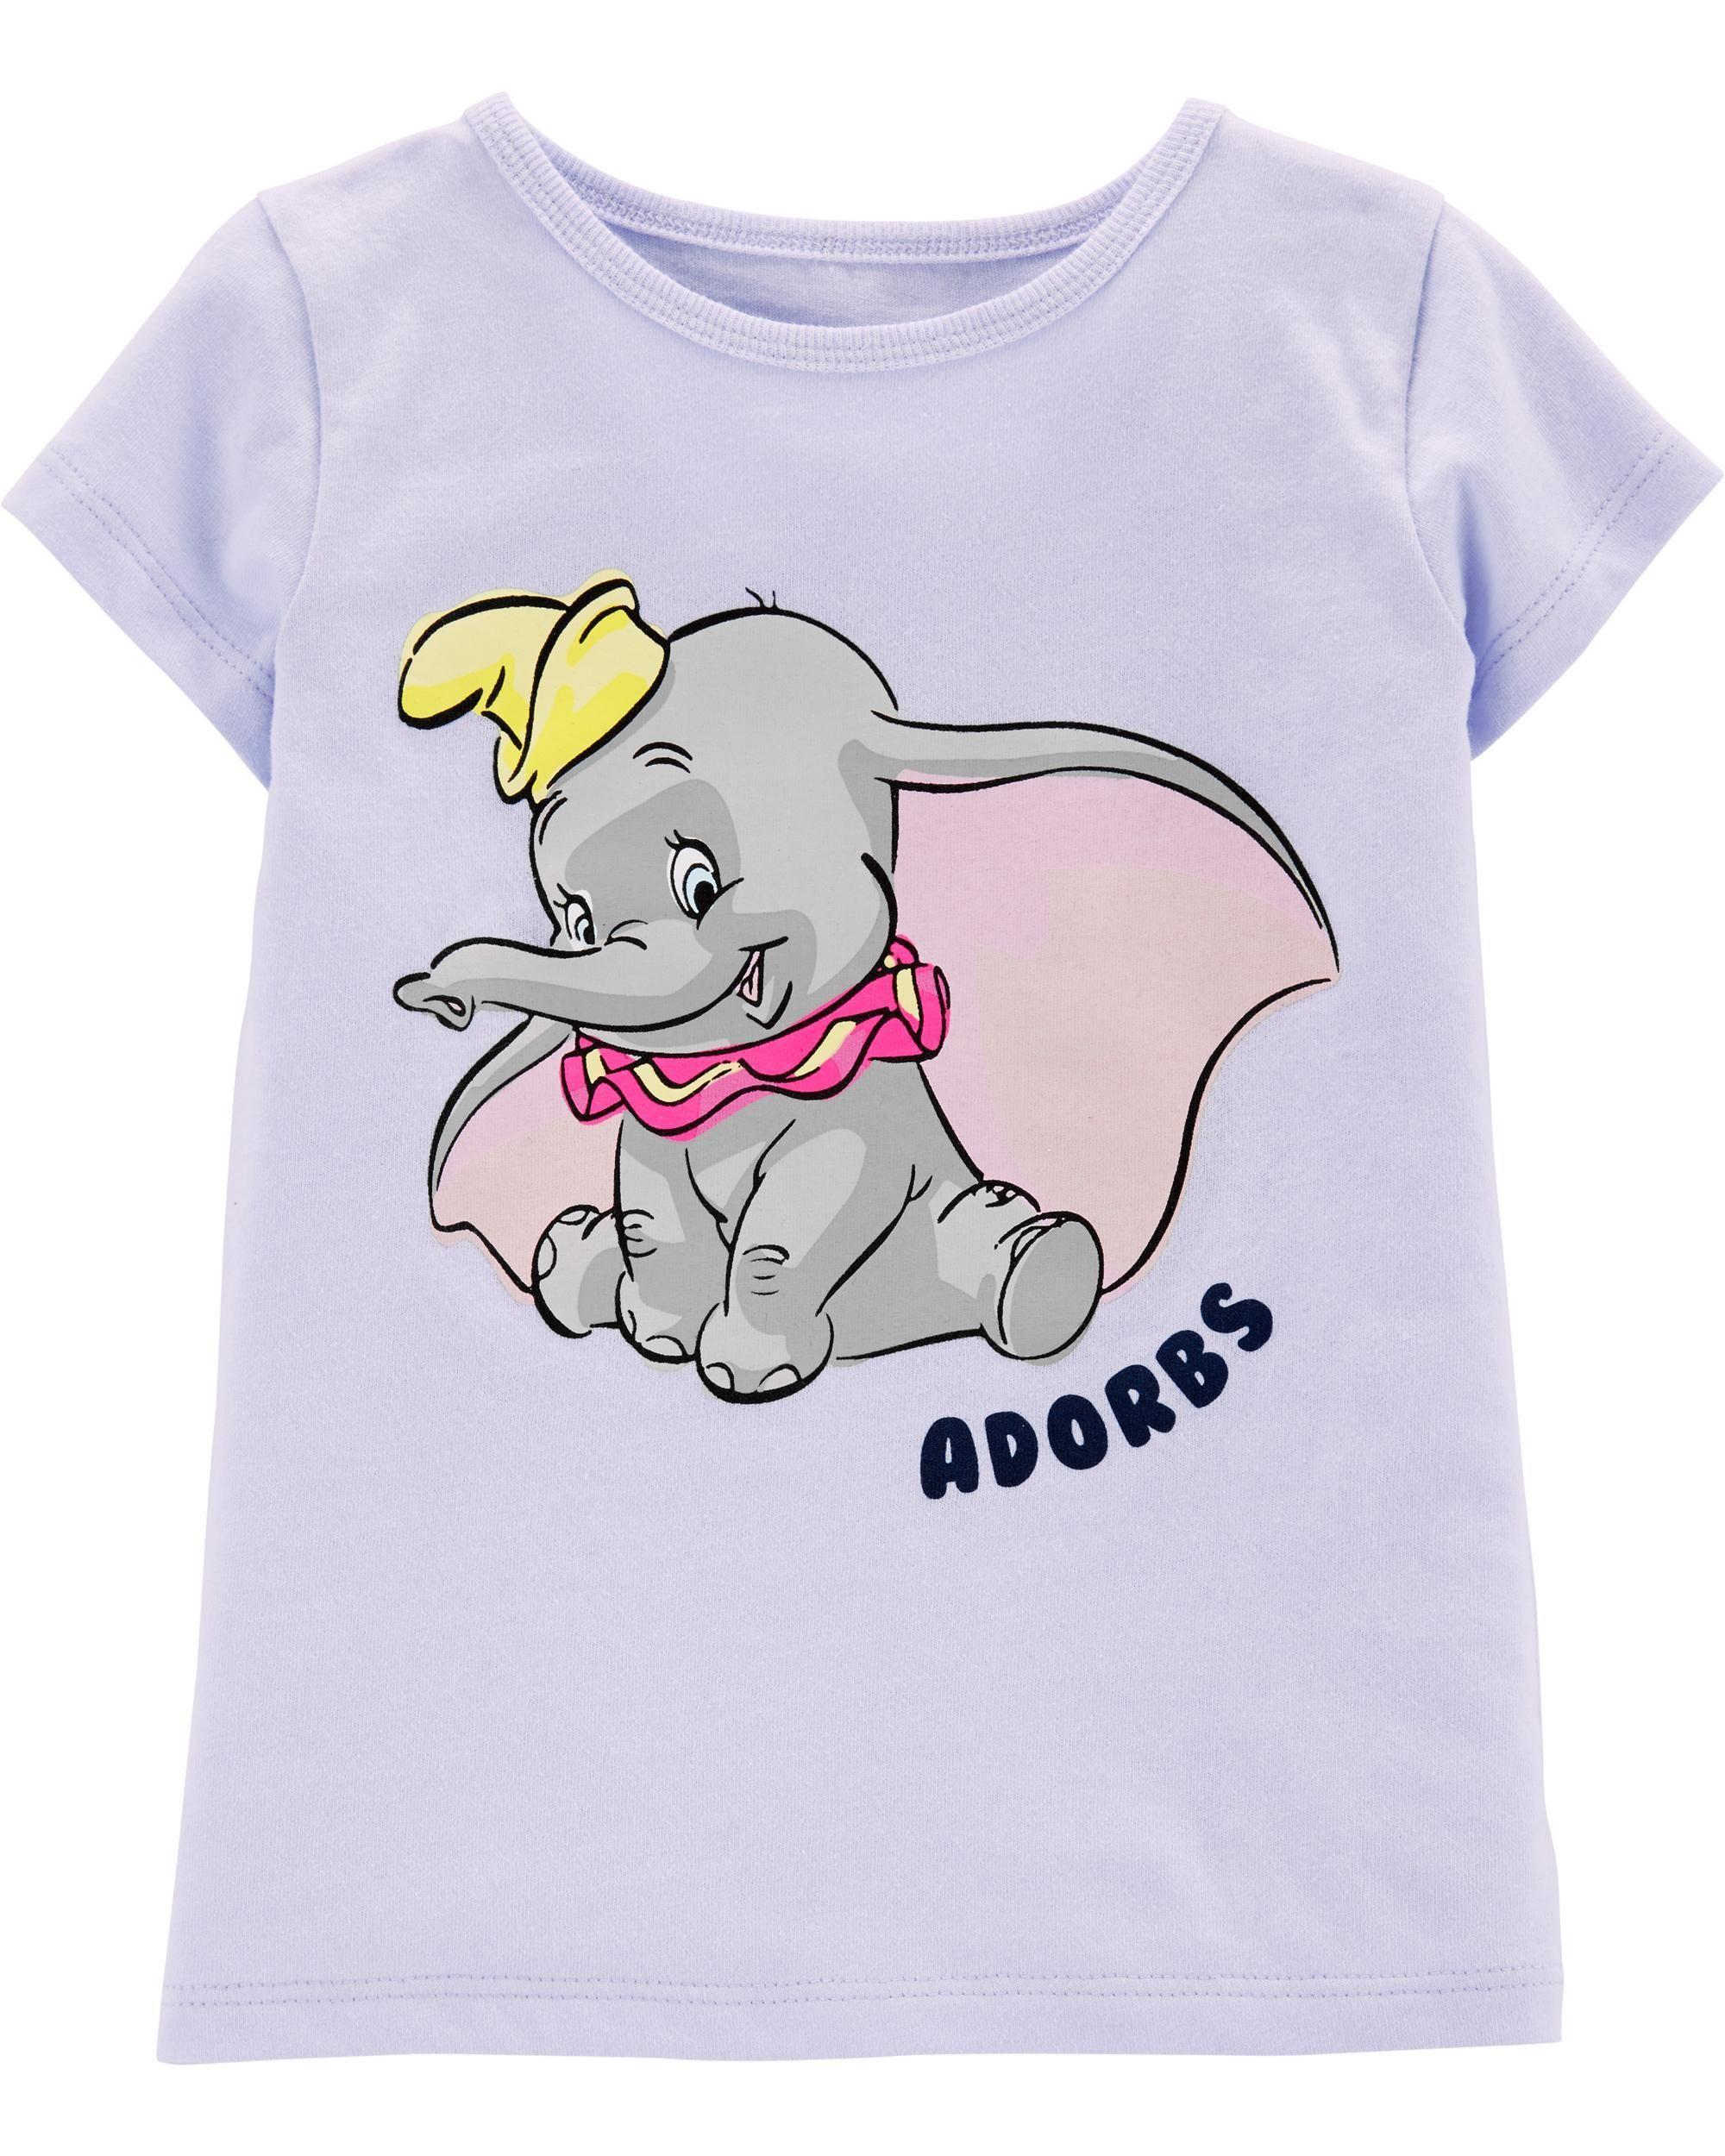 0c48639aad53 Dumbo Tee | For Julia's closet | Kids shirts, Toddler girl, Tees